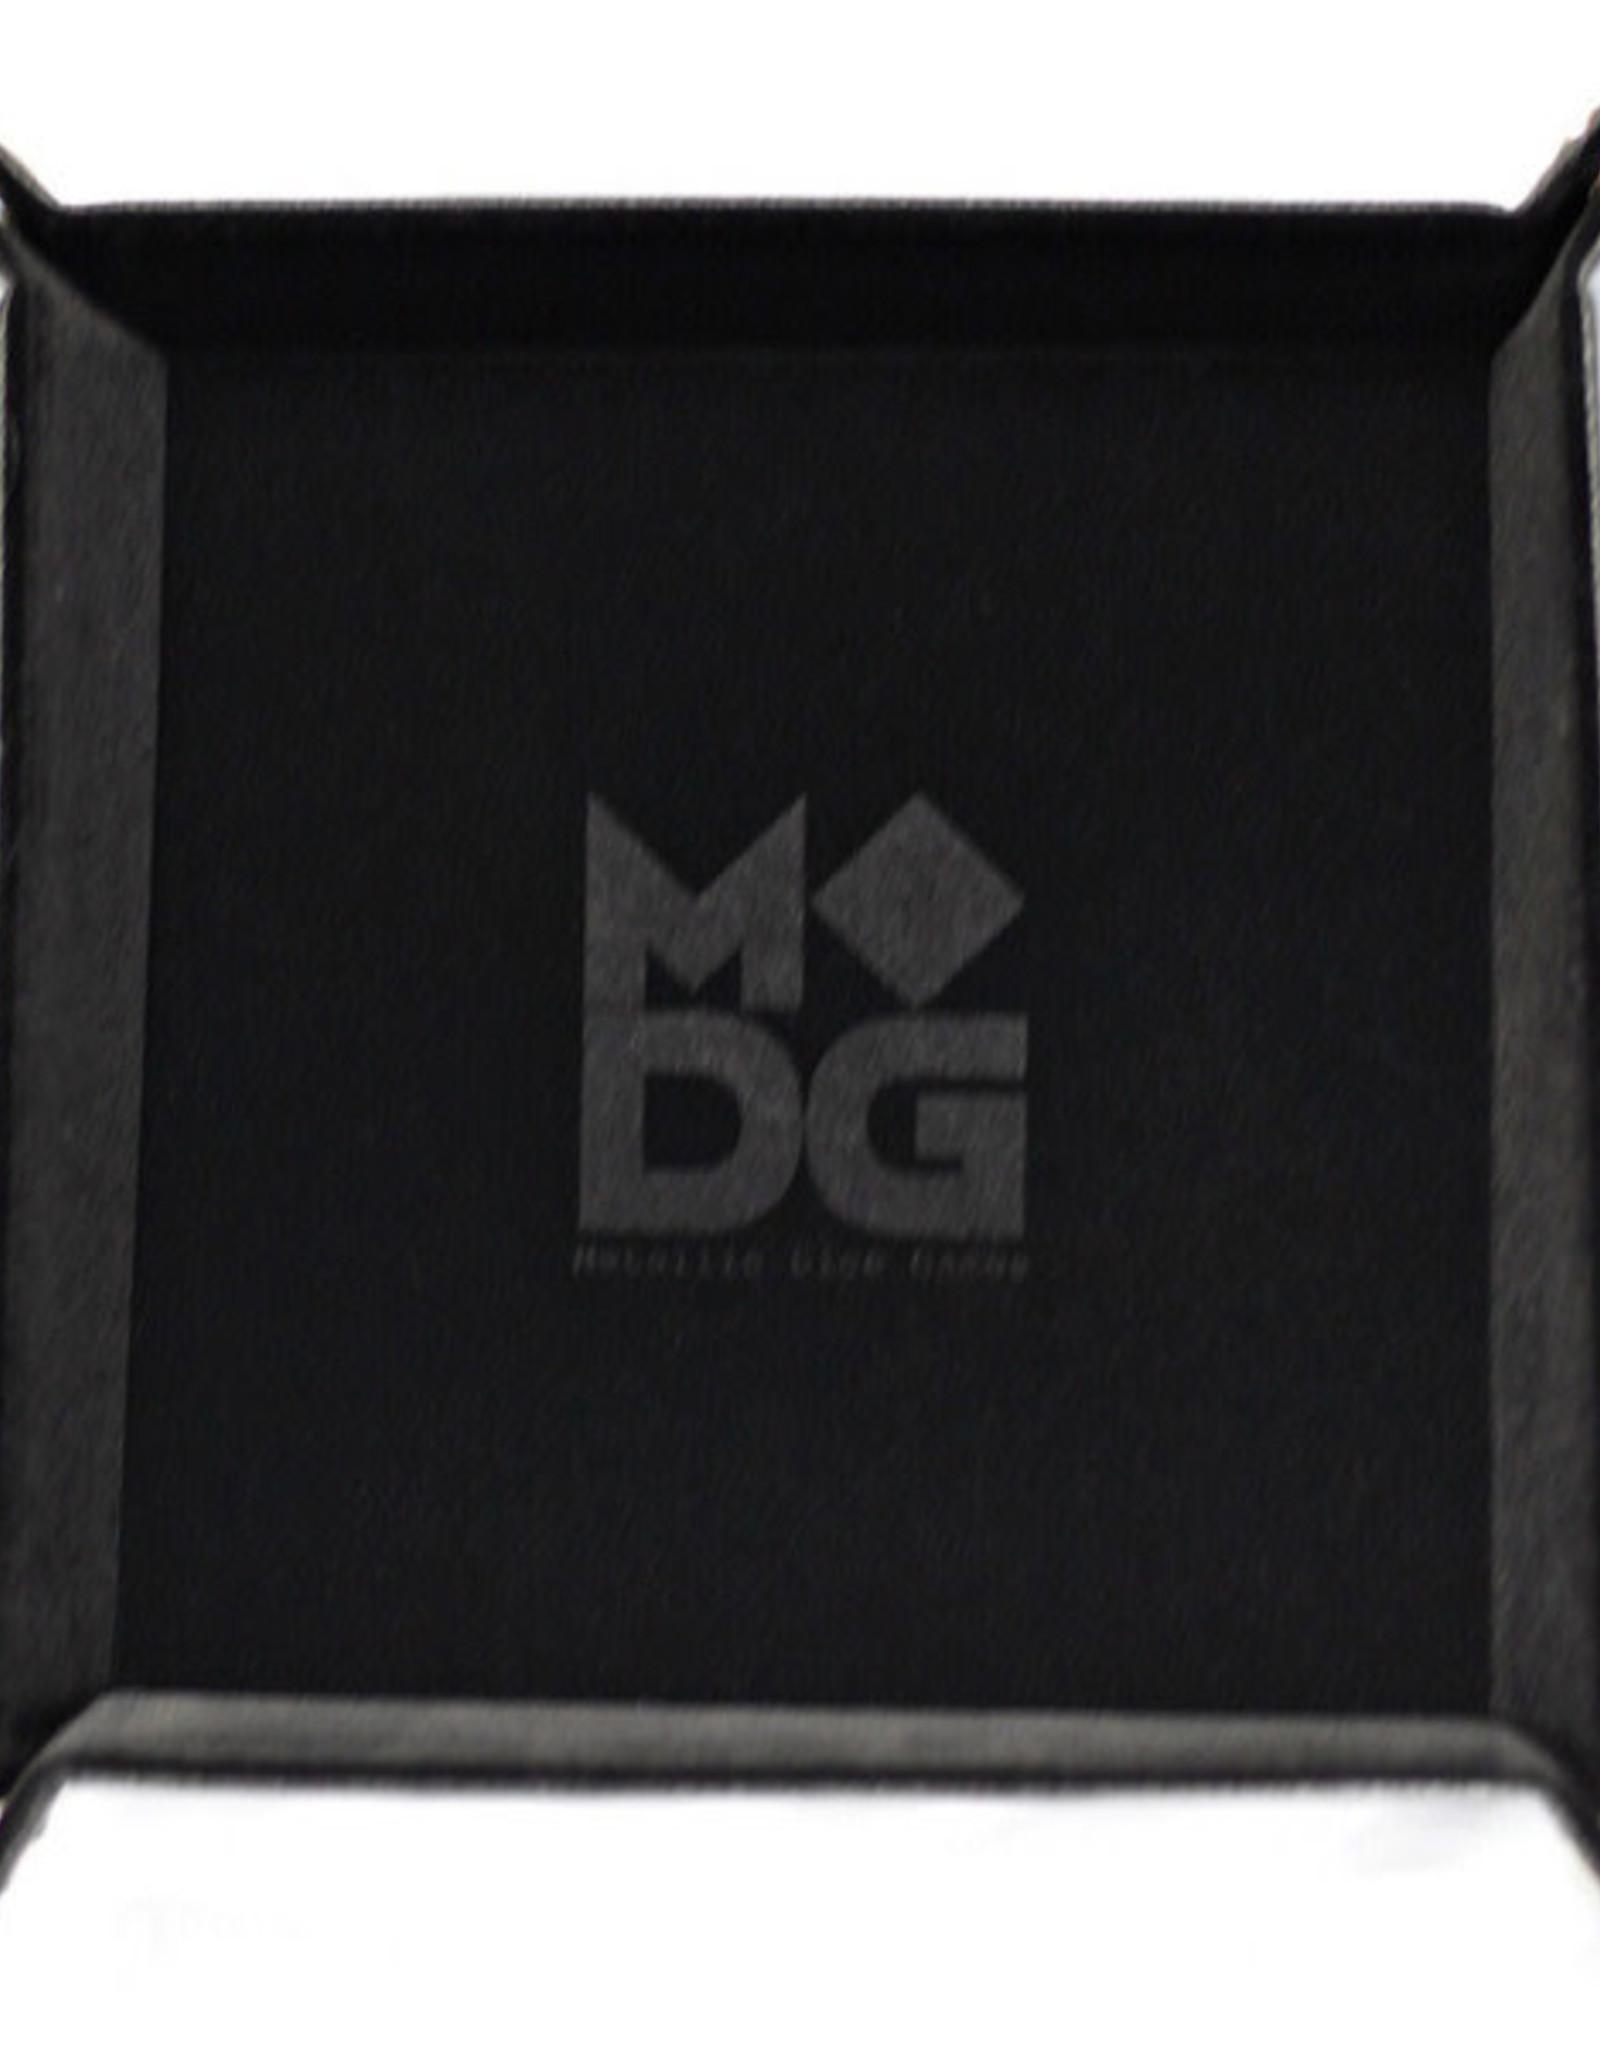 Metallic Dice Games Folding Dice Tray Black Velvet